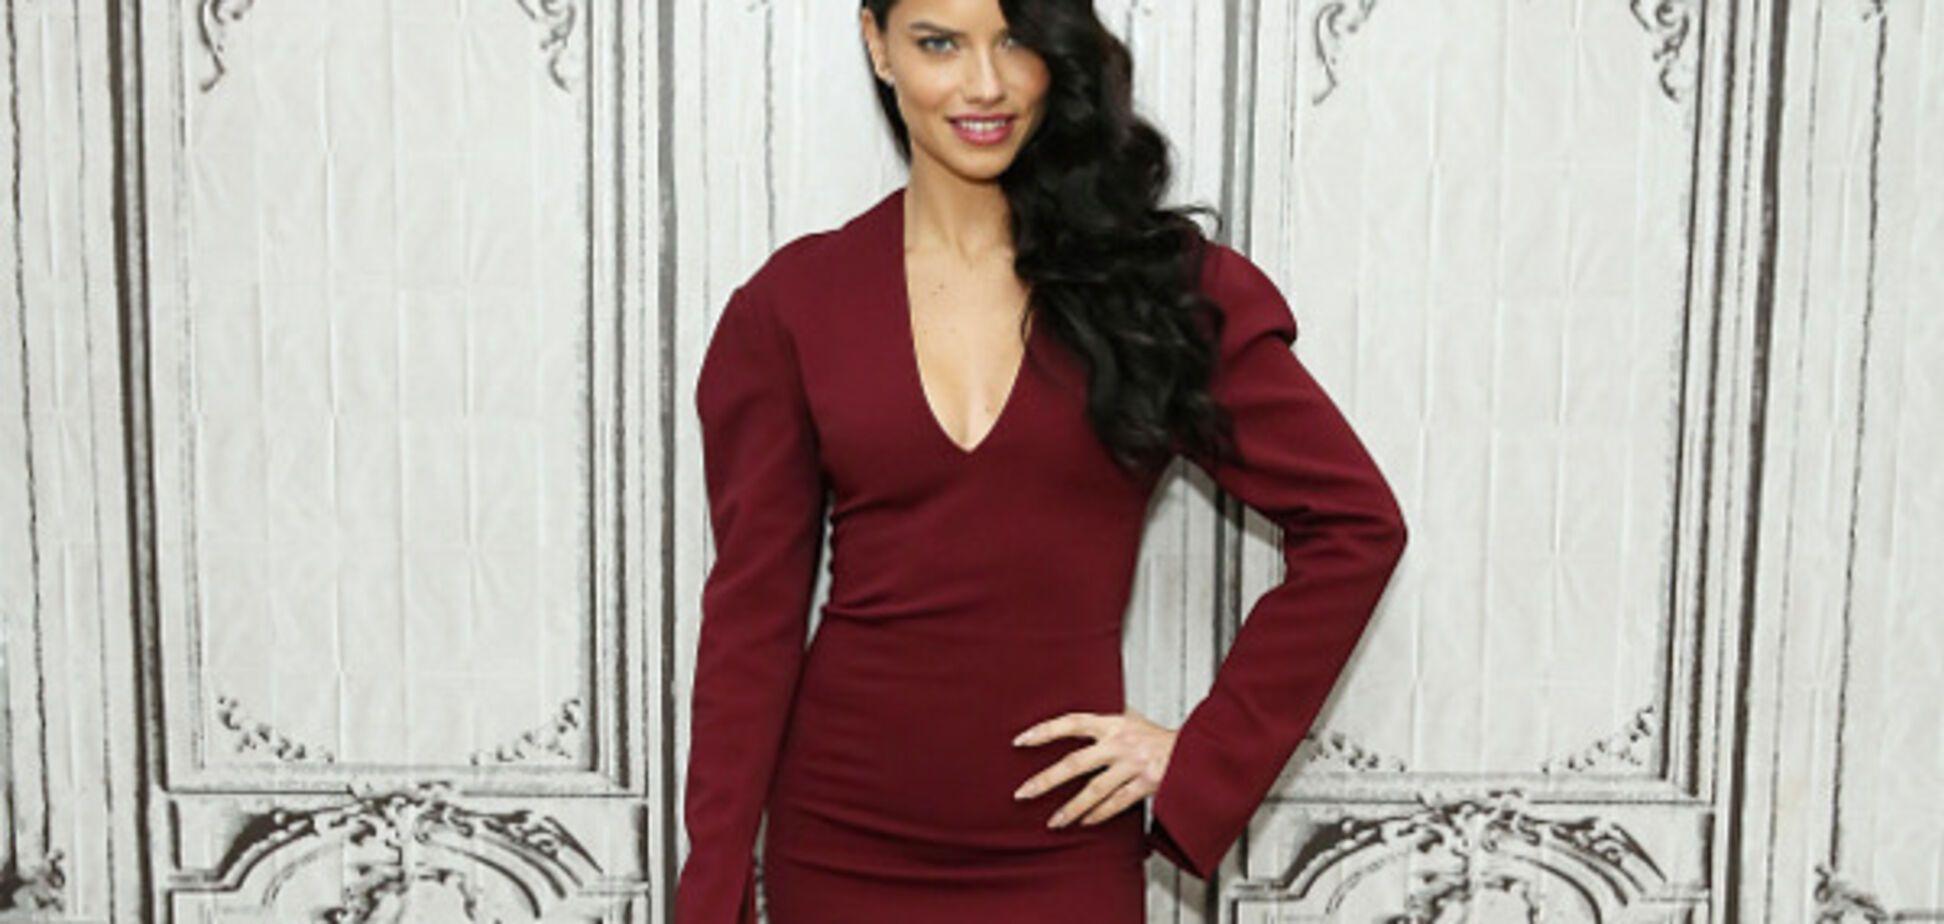 Адріана Ліма: найбільш 'гарячі' та сексуальні фото ангела Victoria's Secret